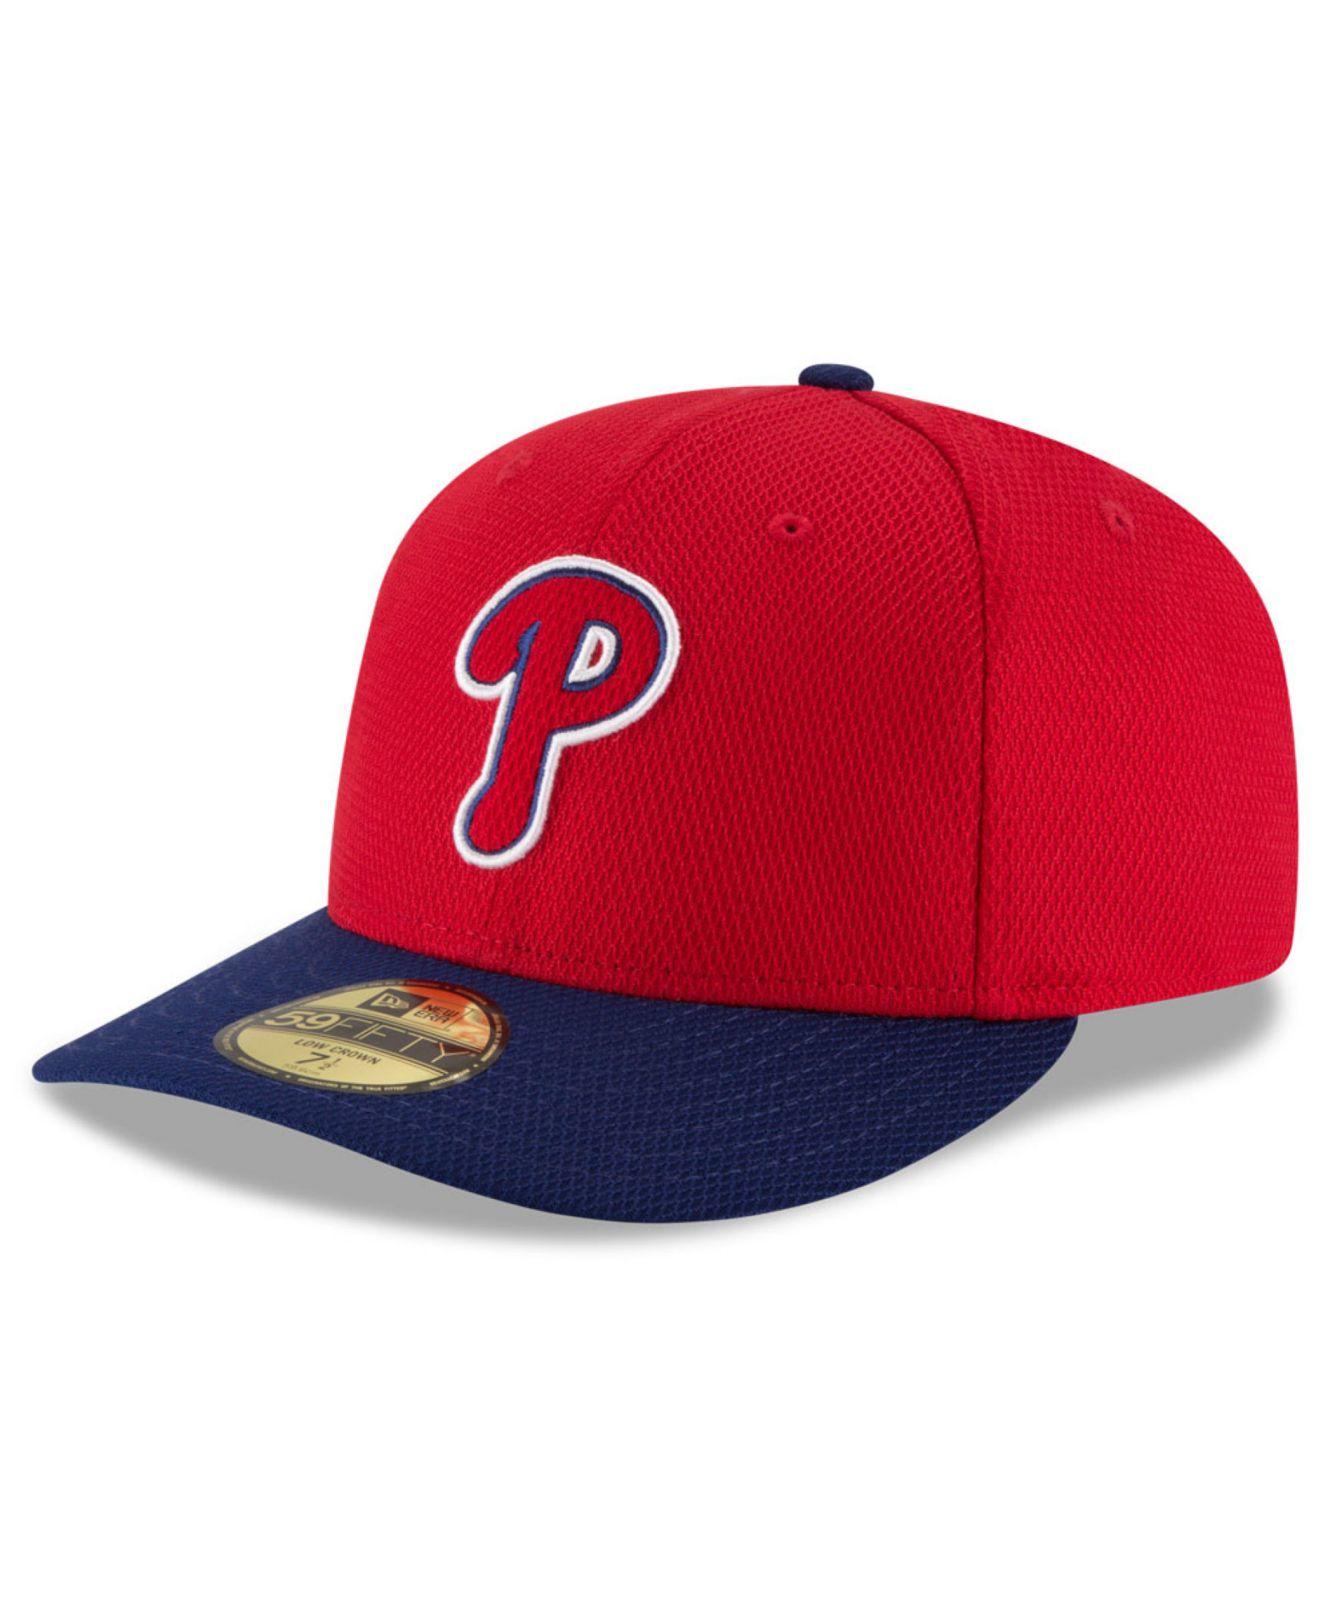 750cfea085d Lyst - KTZ Philadelphia Phillies Low Profile Diamond Era 59fifty Cap ...